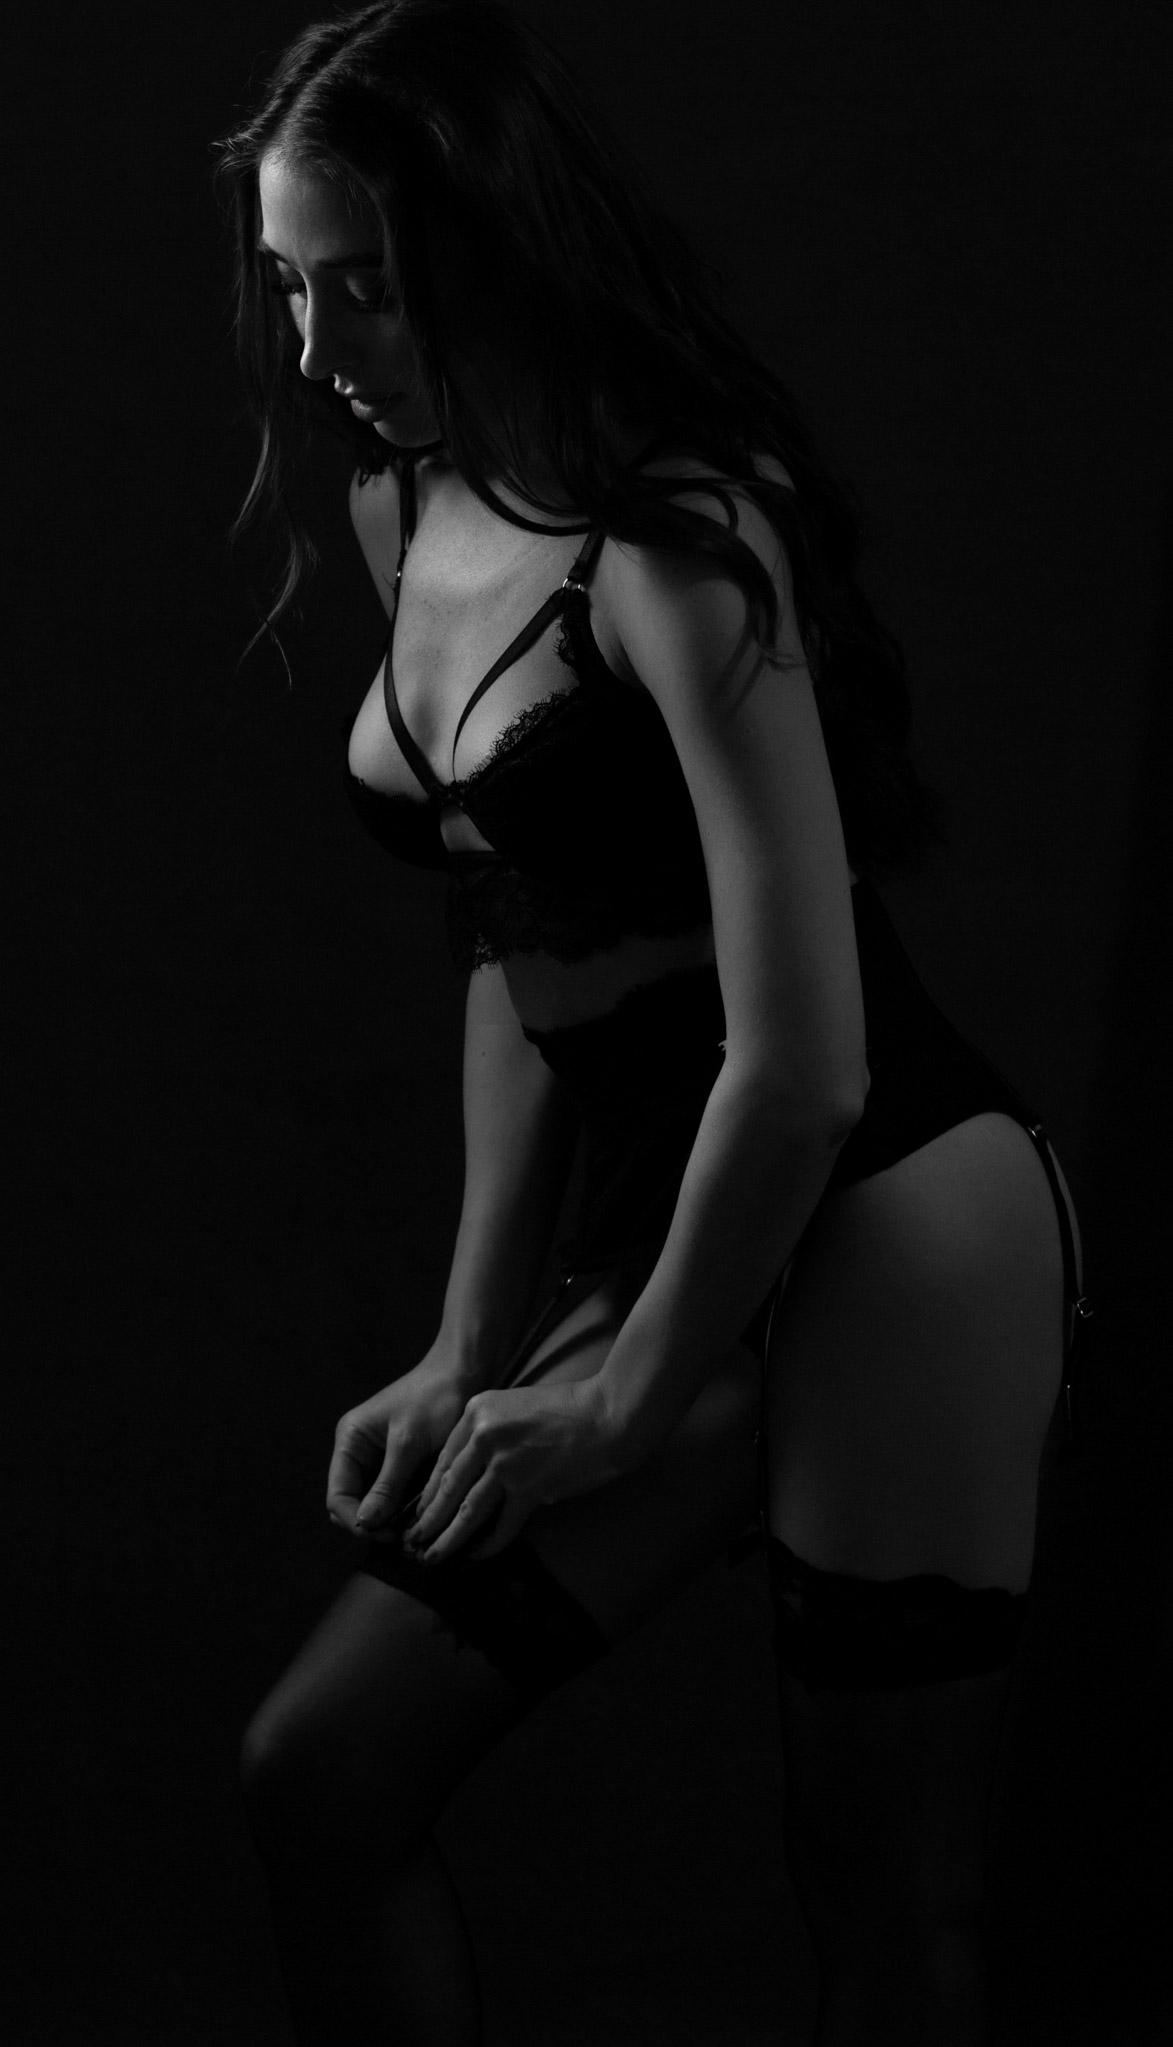 Film noir boudoir photography, black and white lingerie photoshoot, boudoir photographer Birmingham UK and West Midlands